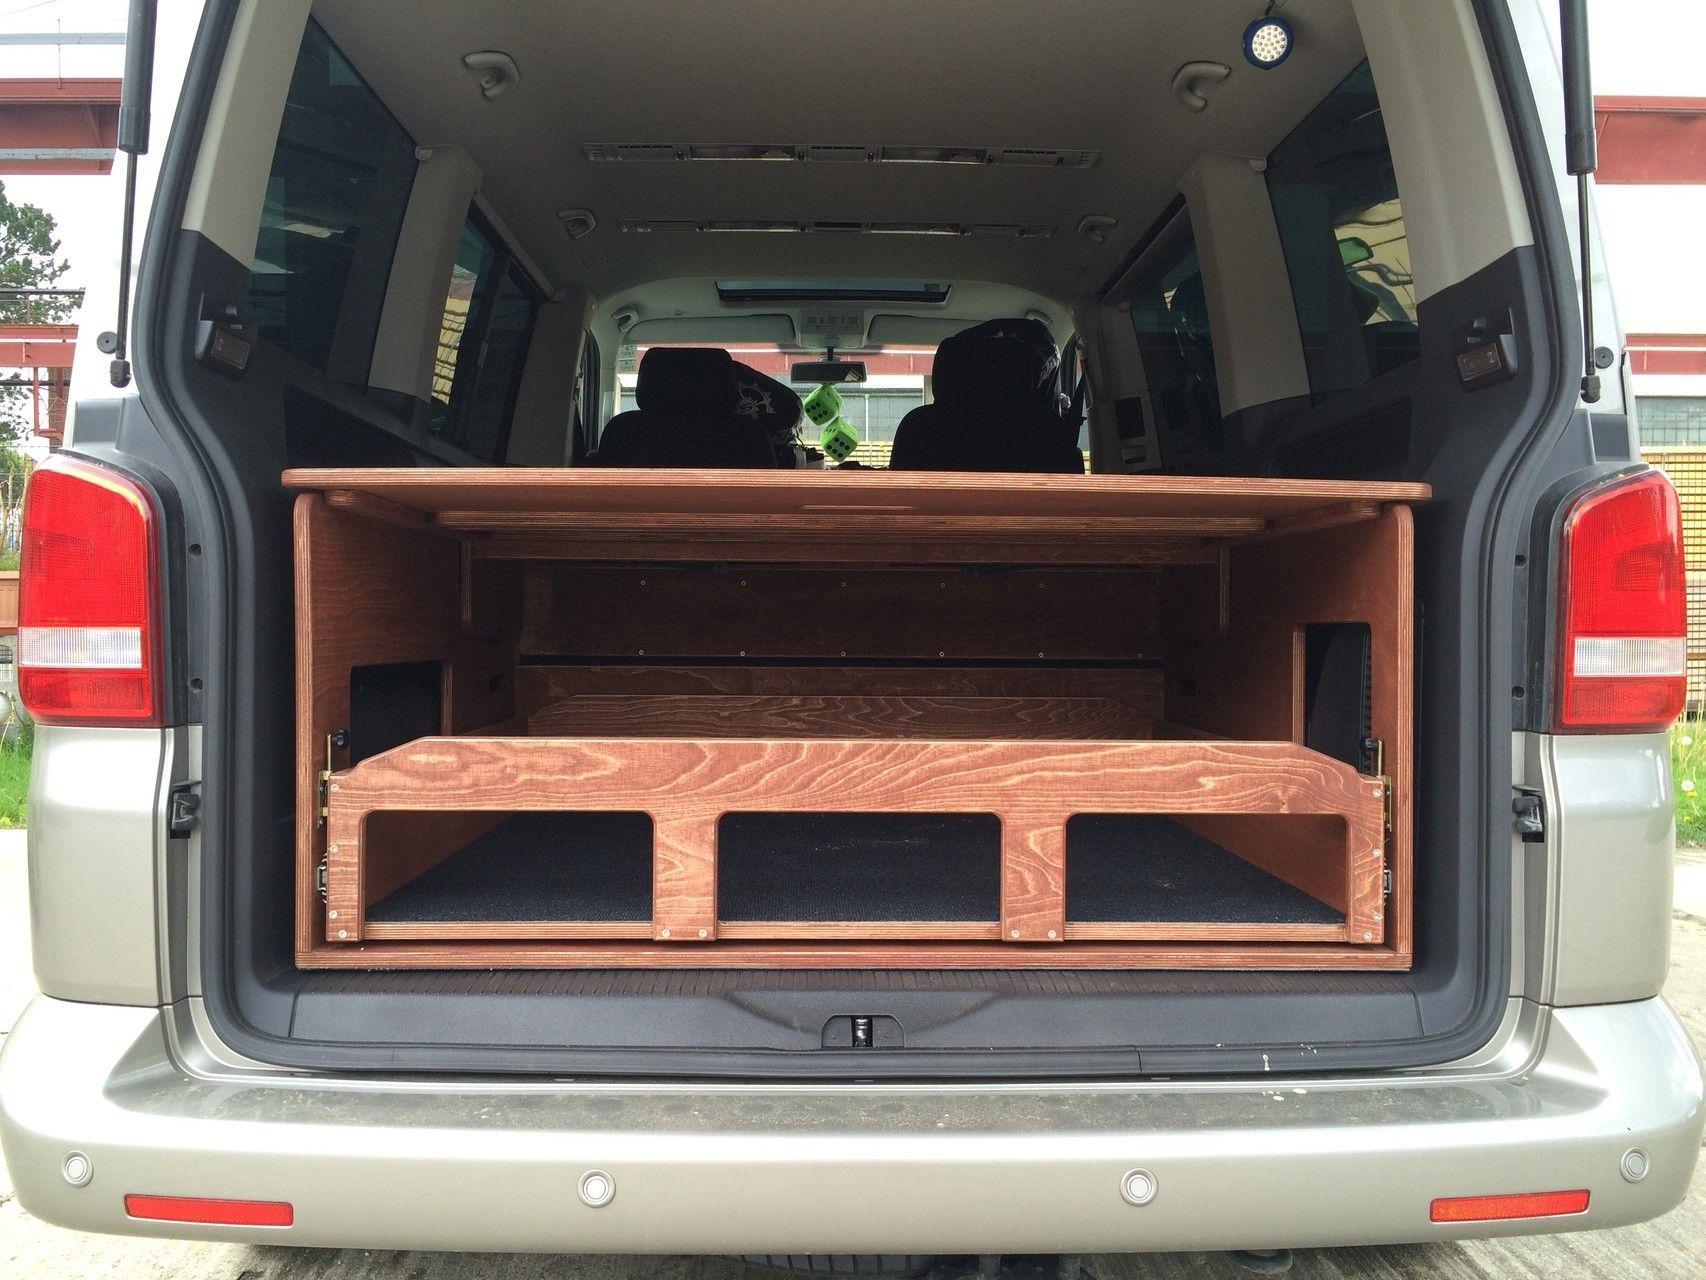 fahrzeugausbau camping multiflexboard alternative vw t5. Black Bedroom Furniture Sets. Home Design Ideas